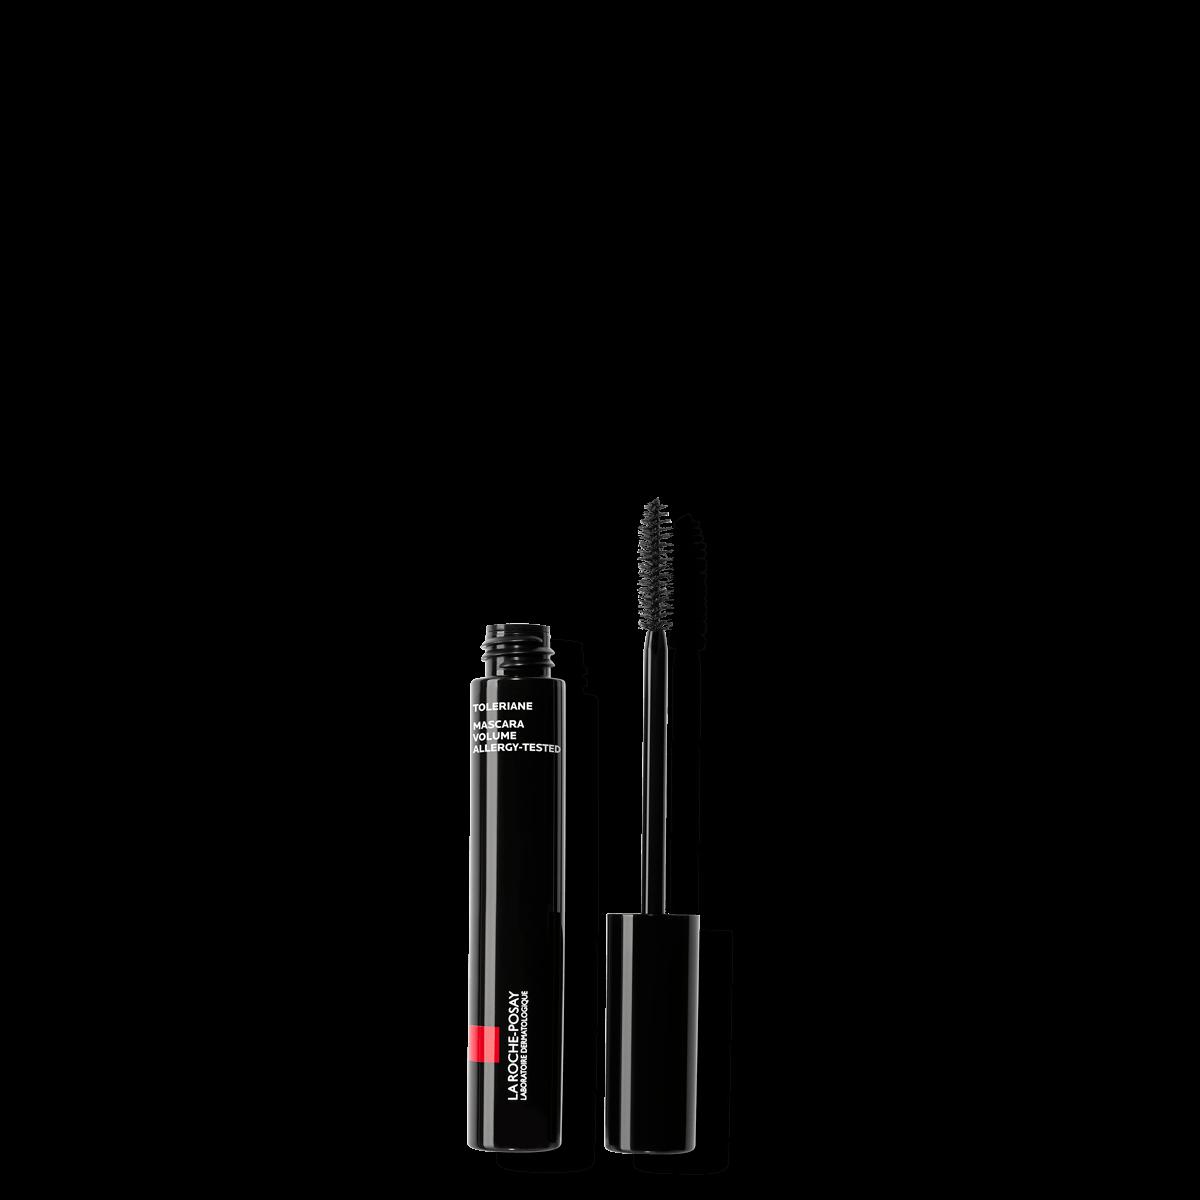 La Roche Posay Sensitive Toleriane Make up VOLUME MASCARA Brown 333787